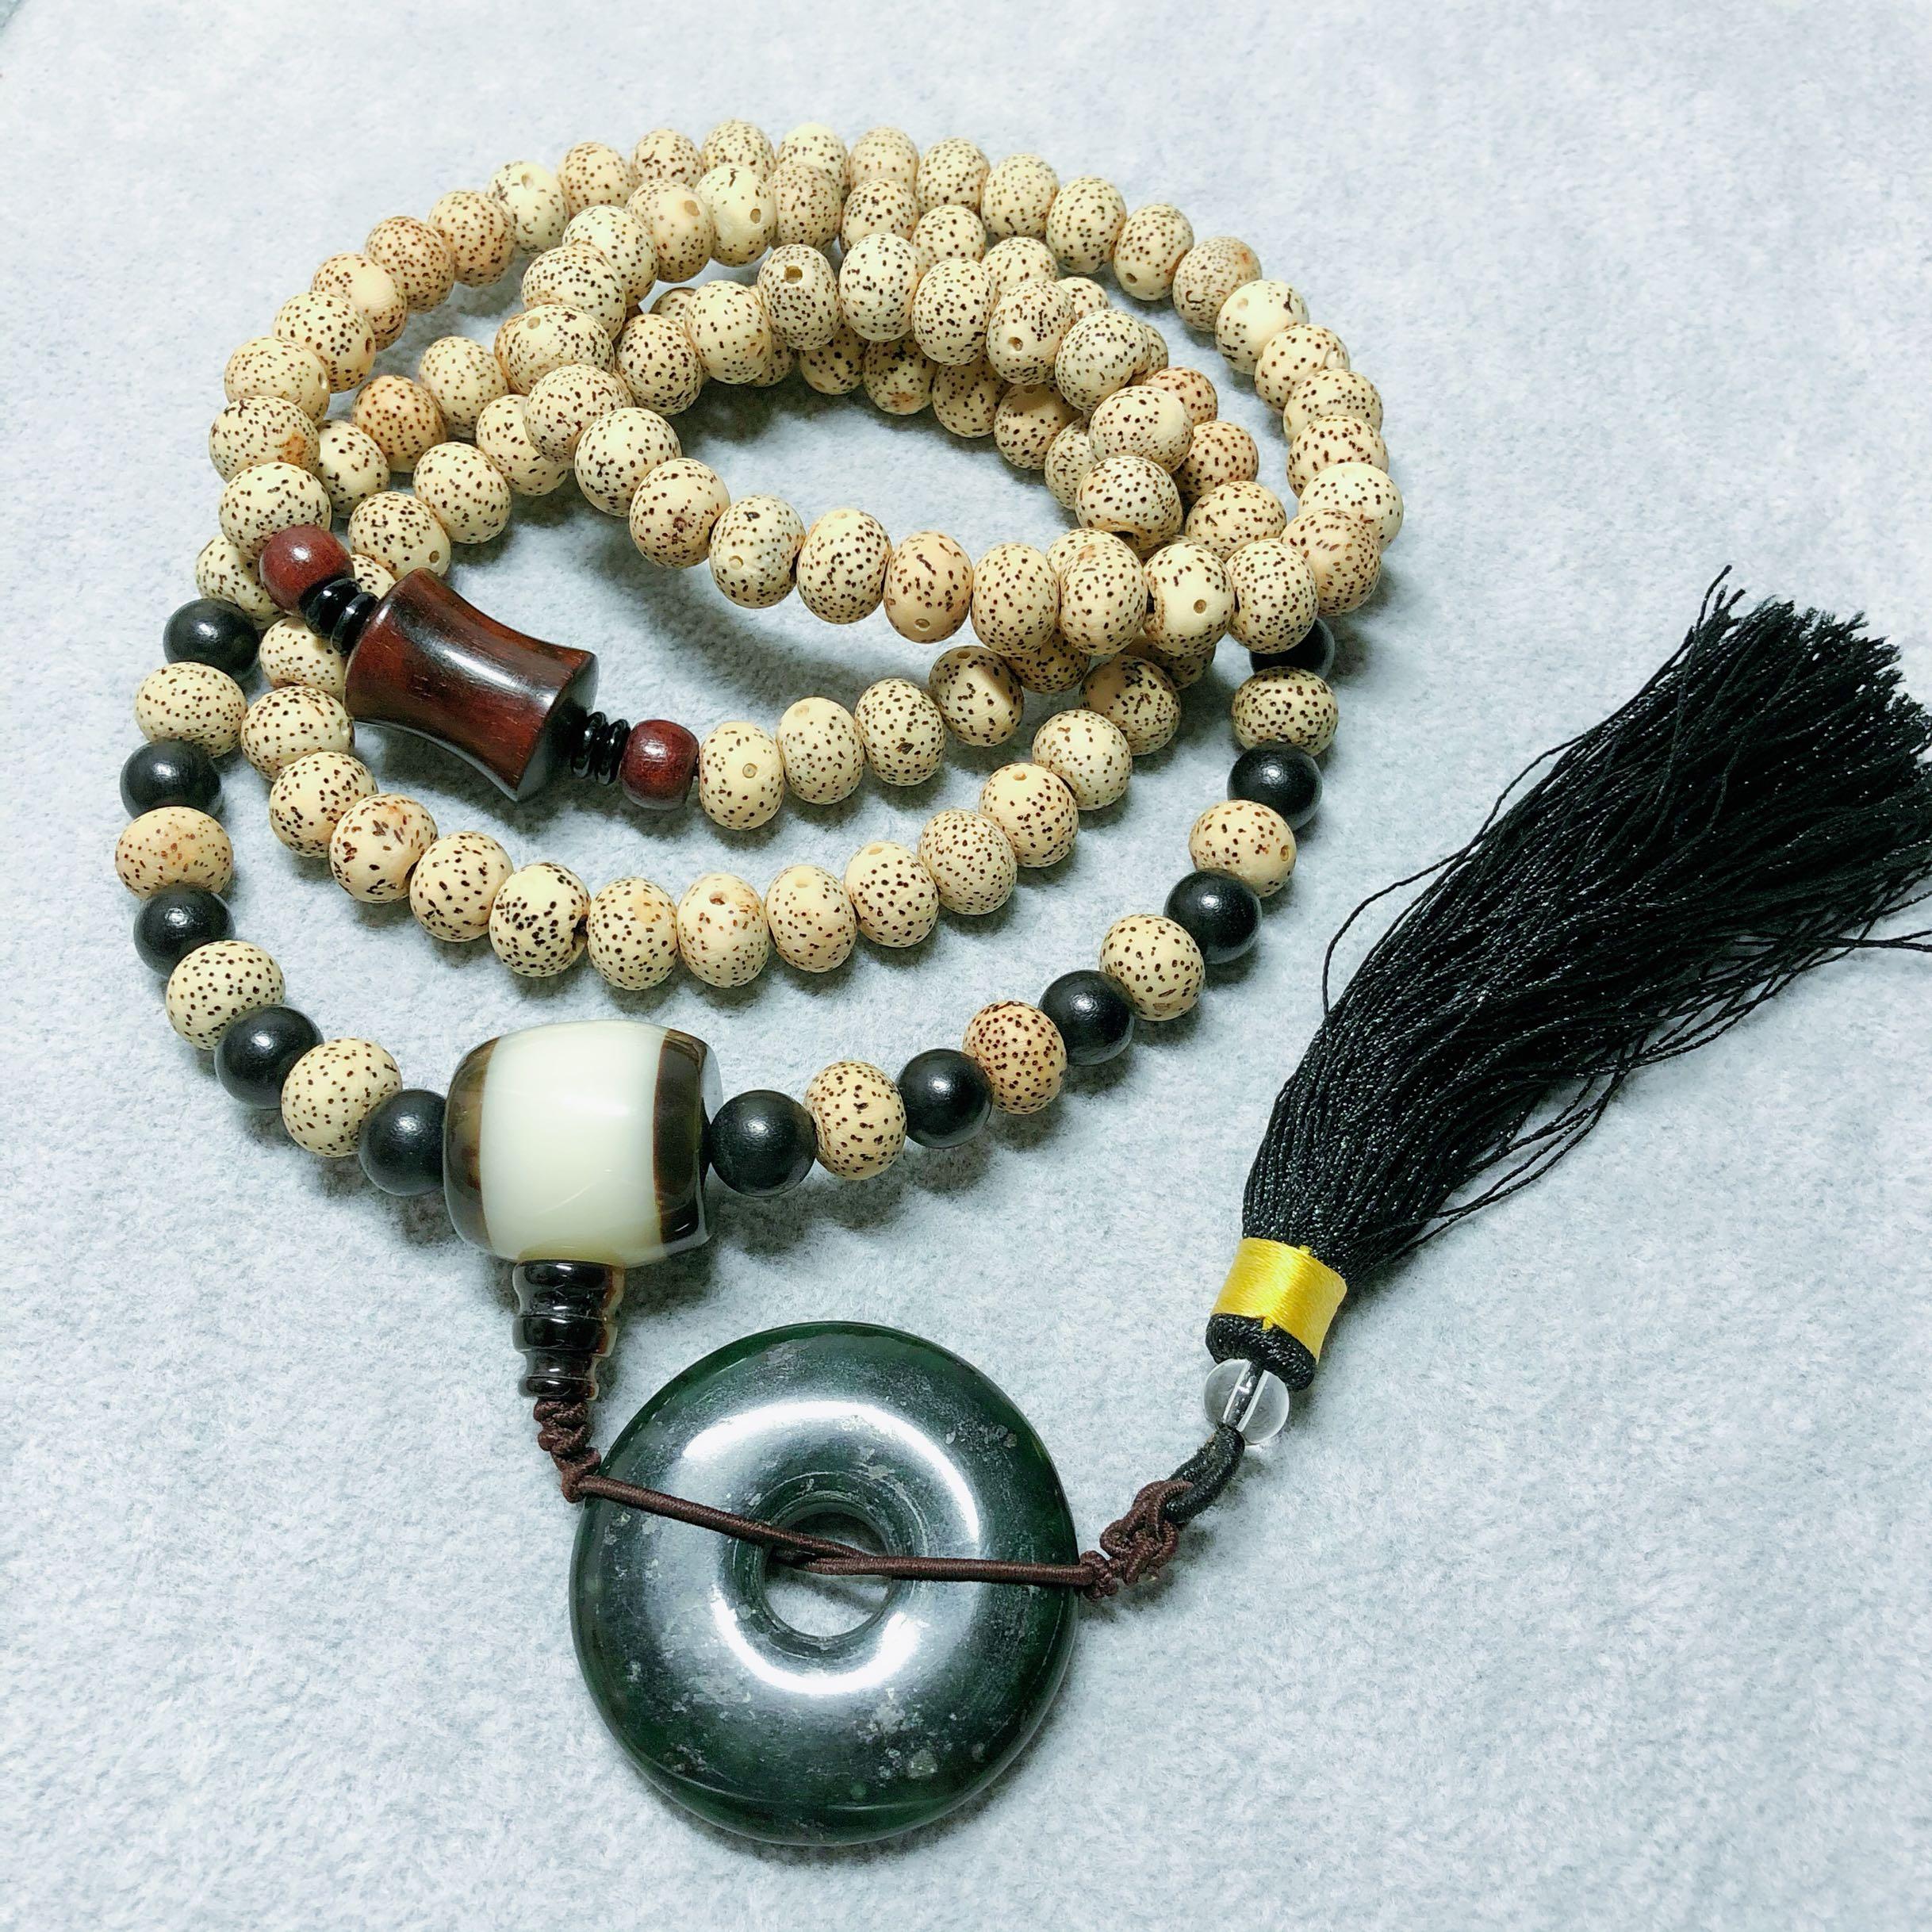 Star Moon Bodhi black jade safety clasp small leaf red sandalwood tassel hand string Buddha bead necklace